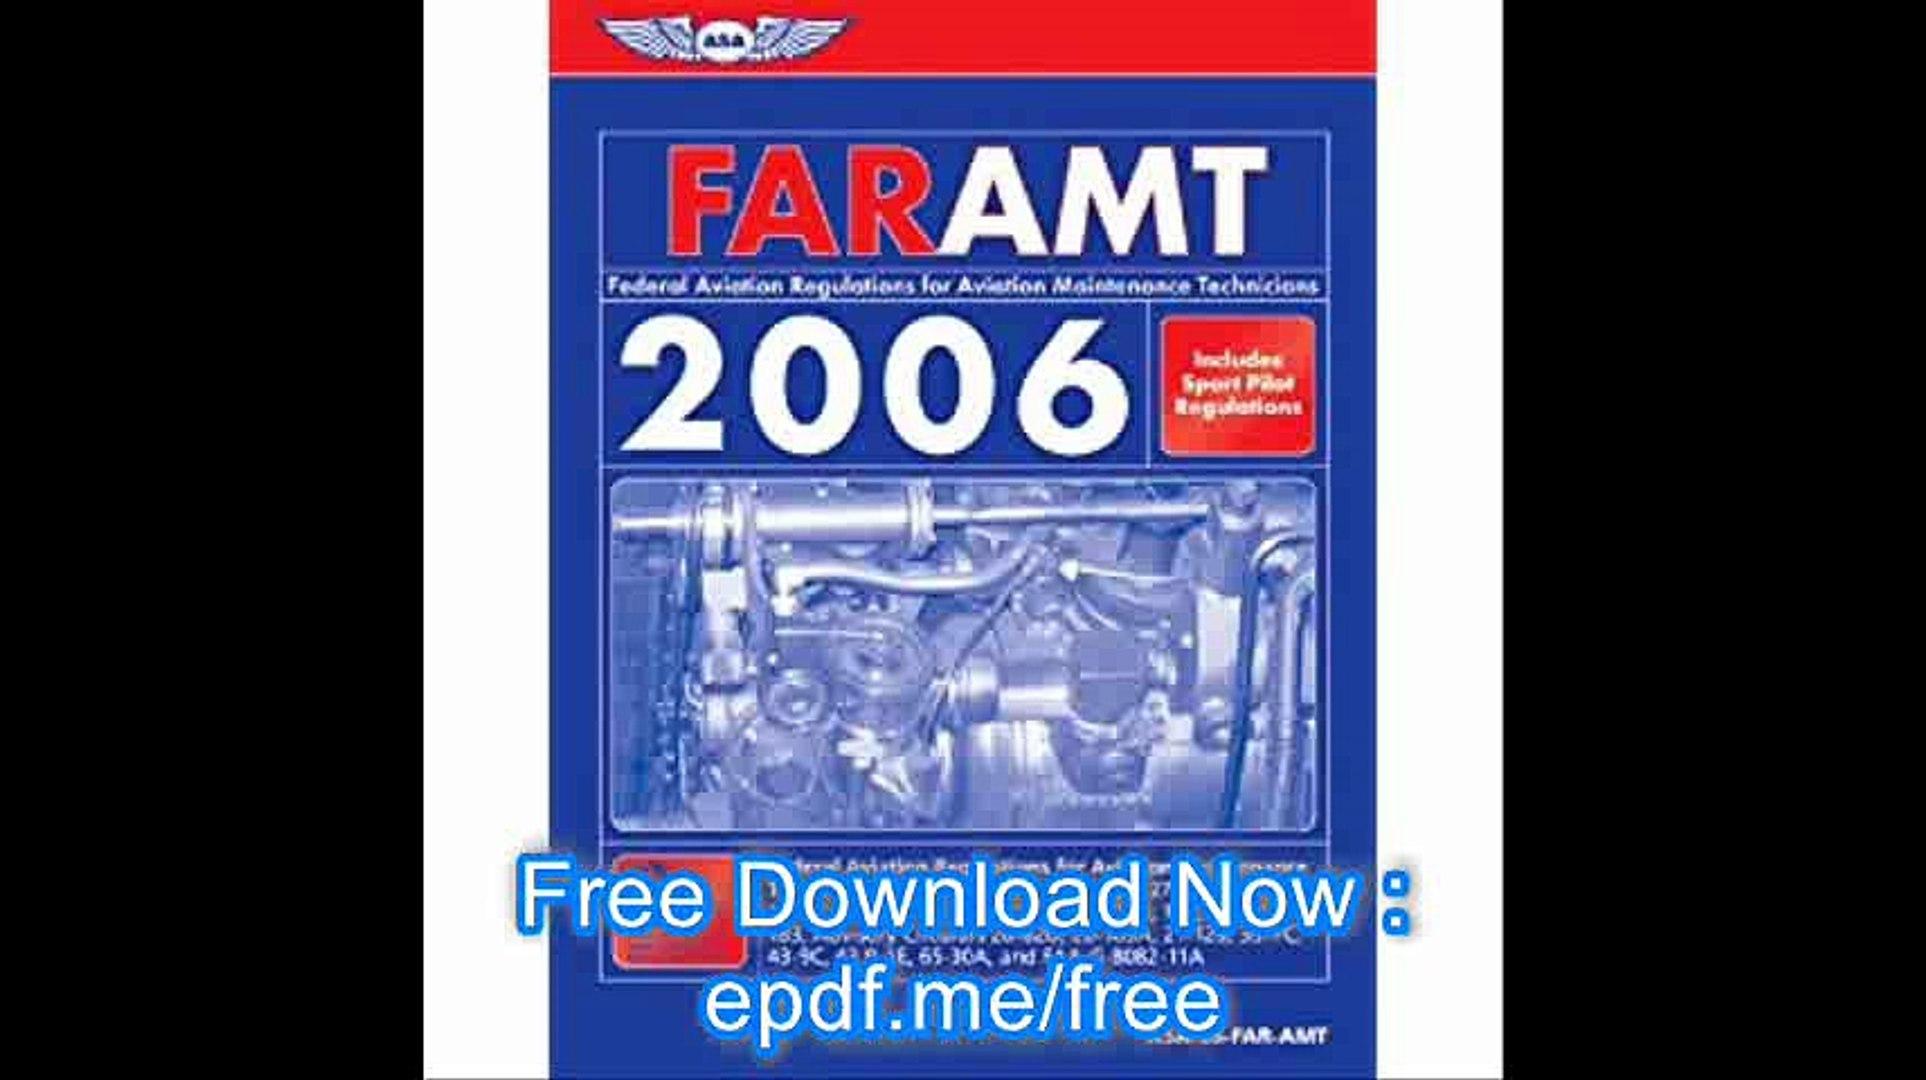 FAR-AMT 2006 Federal Aviation Regulations for Aviation Maintenance Technicians 2006 (FAR-AIM series)